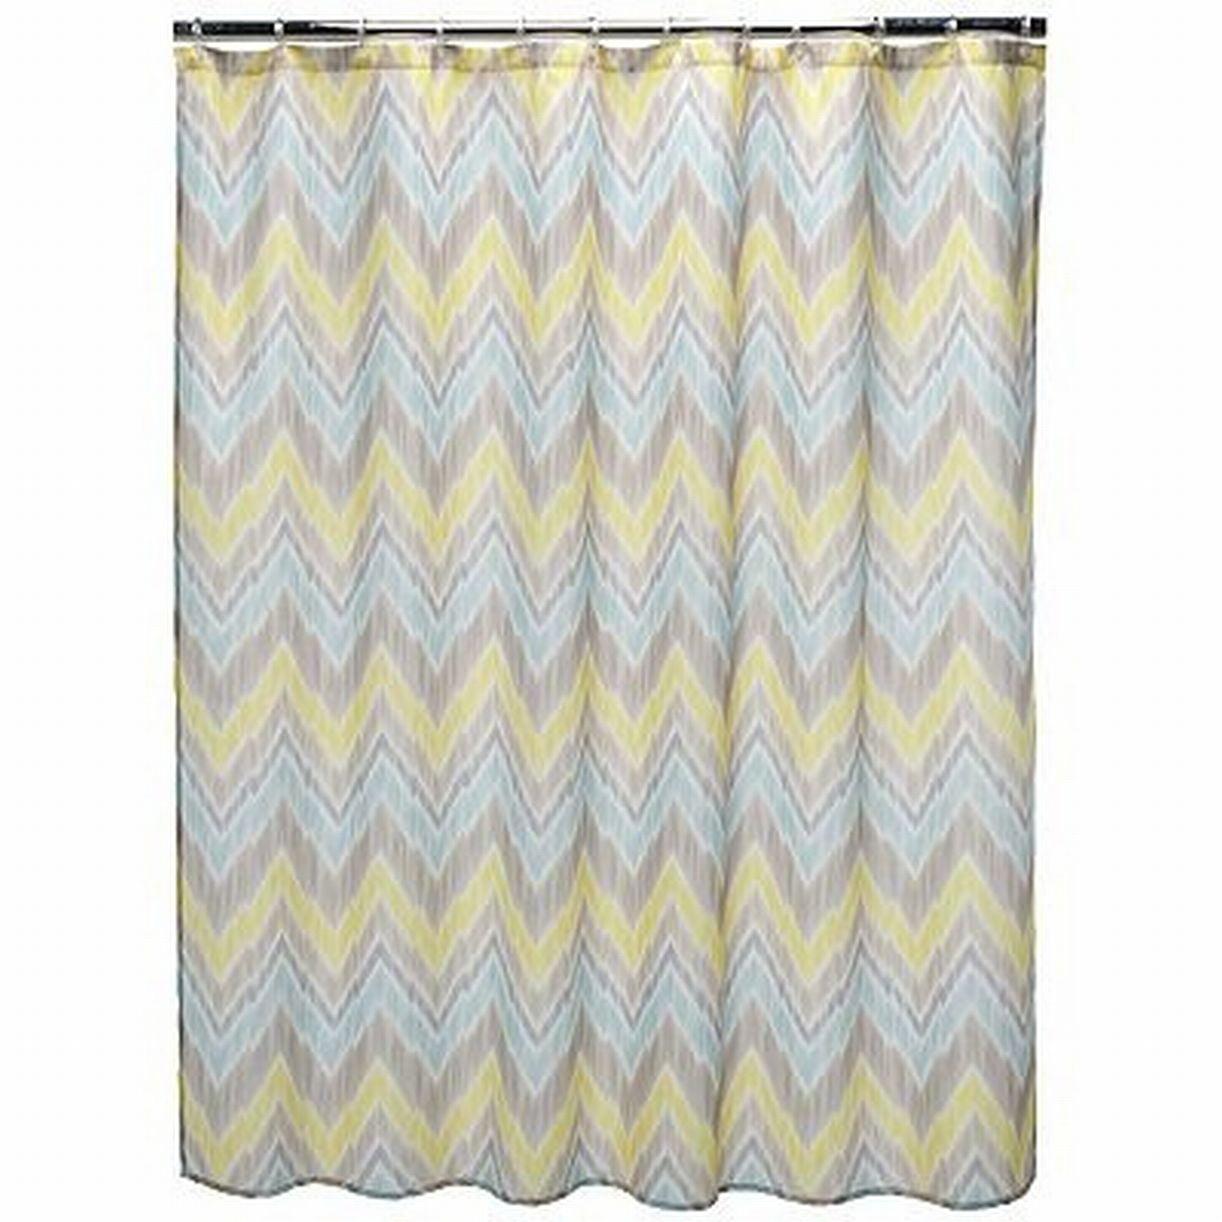 Home Classics Tribal Finds Fabric Shower Curtain Yellow Blue Chevron Bath Decor